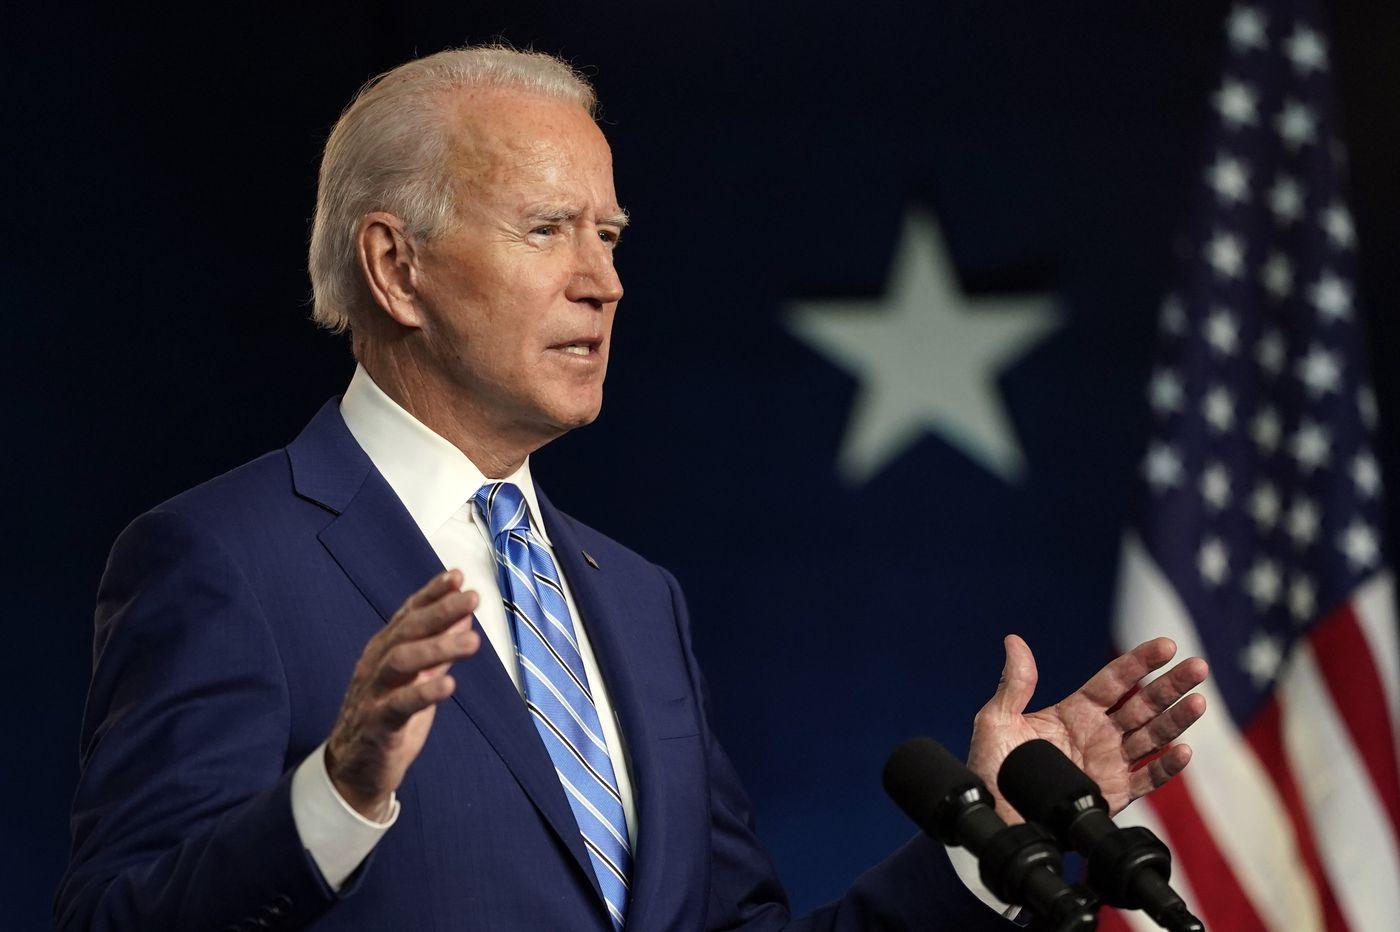 Biden's close, but Pa. still hangs in the balance | Morning Newsletter